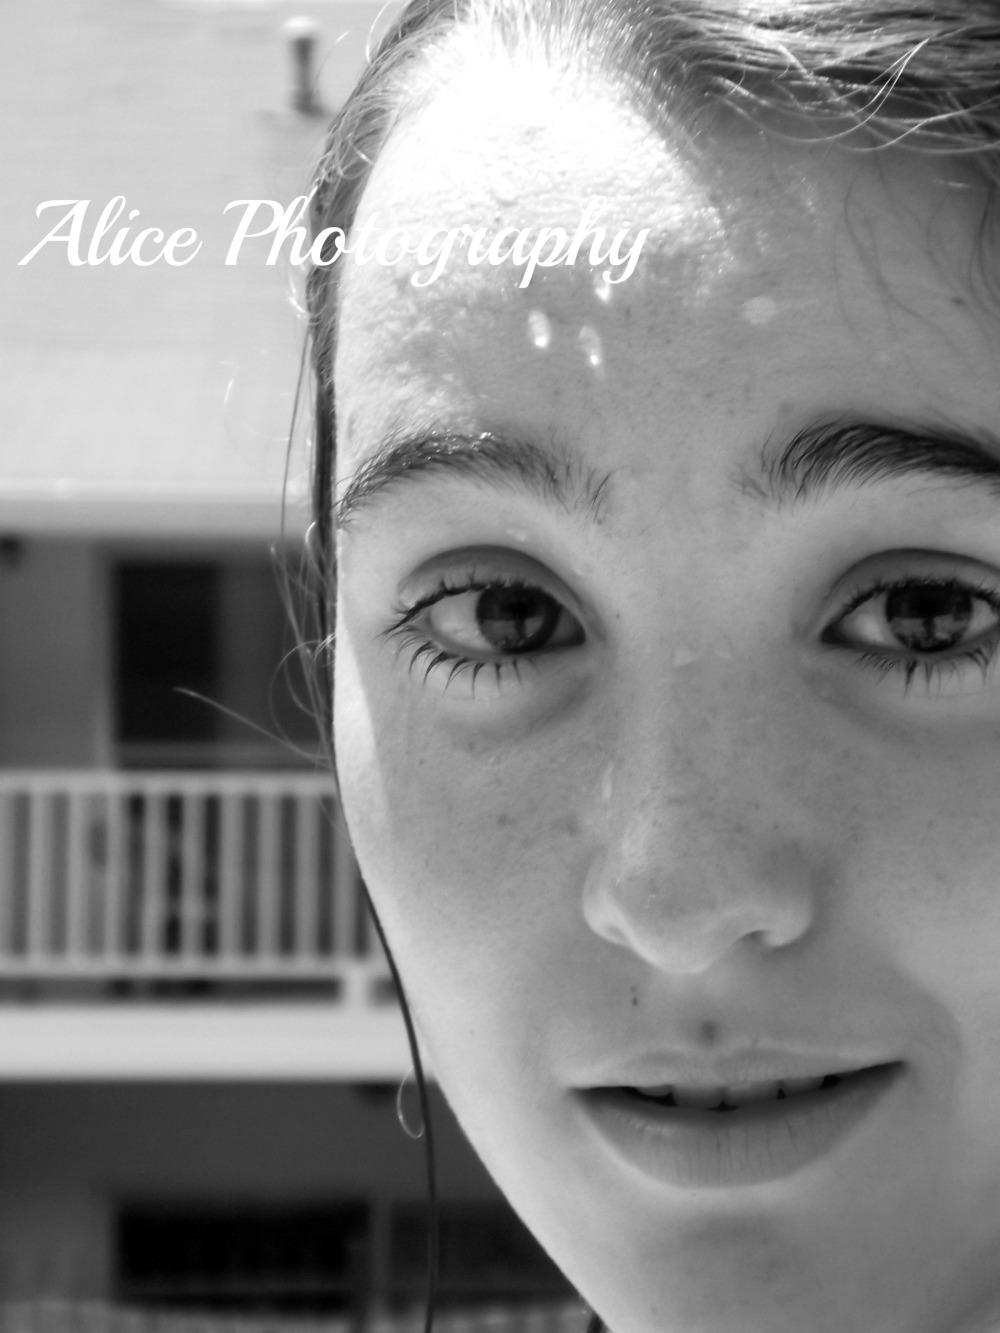 Allison went swimming